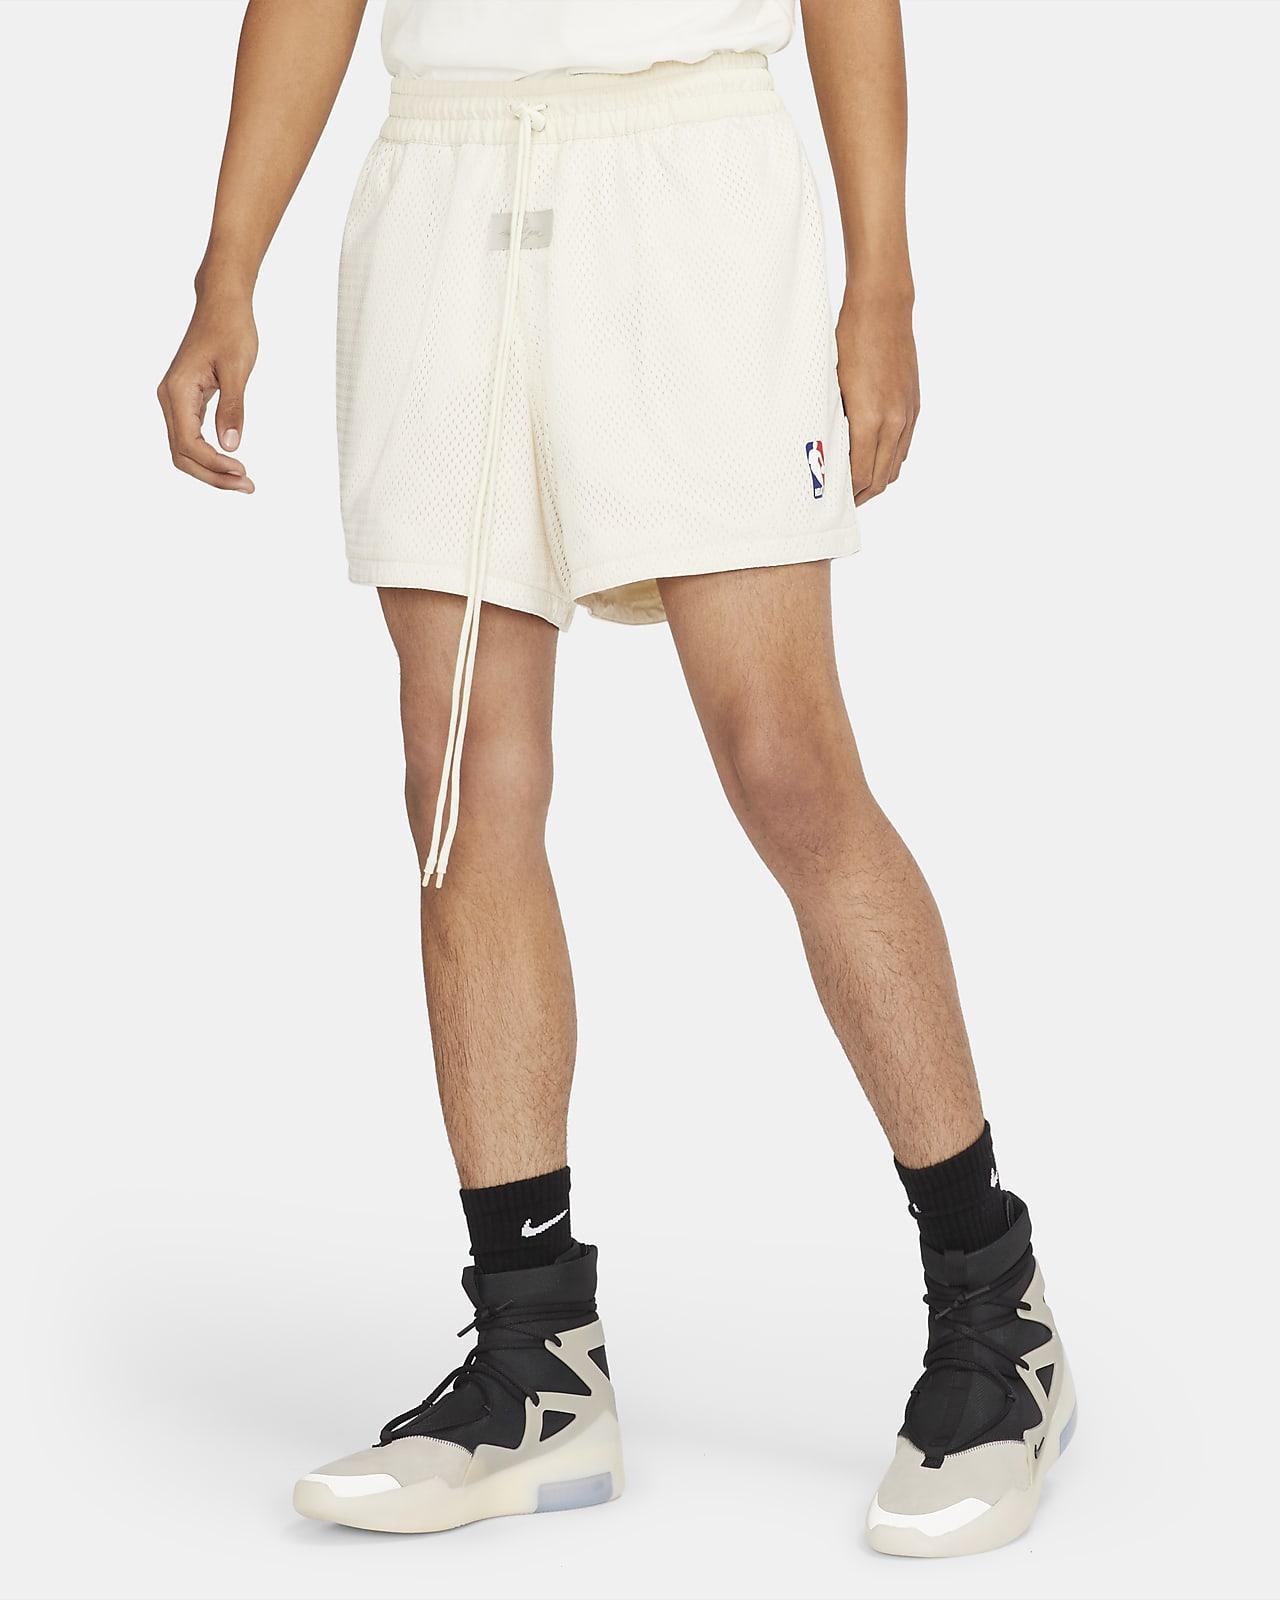 Nike x Fear of God Basketball Shorts